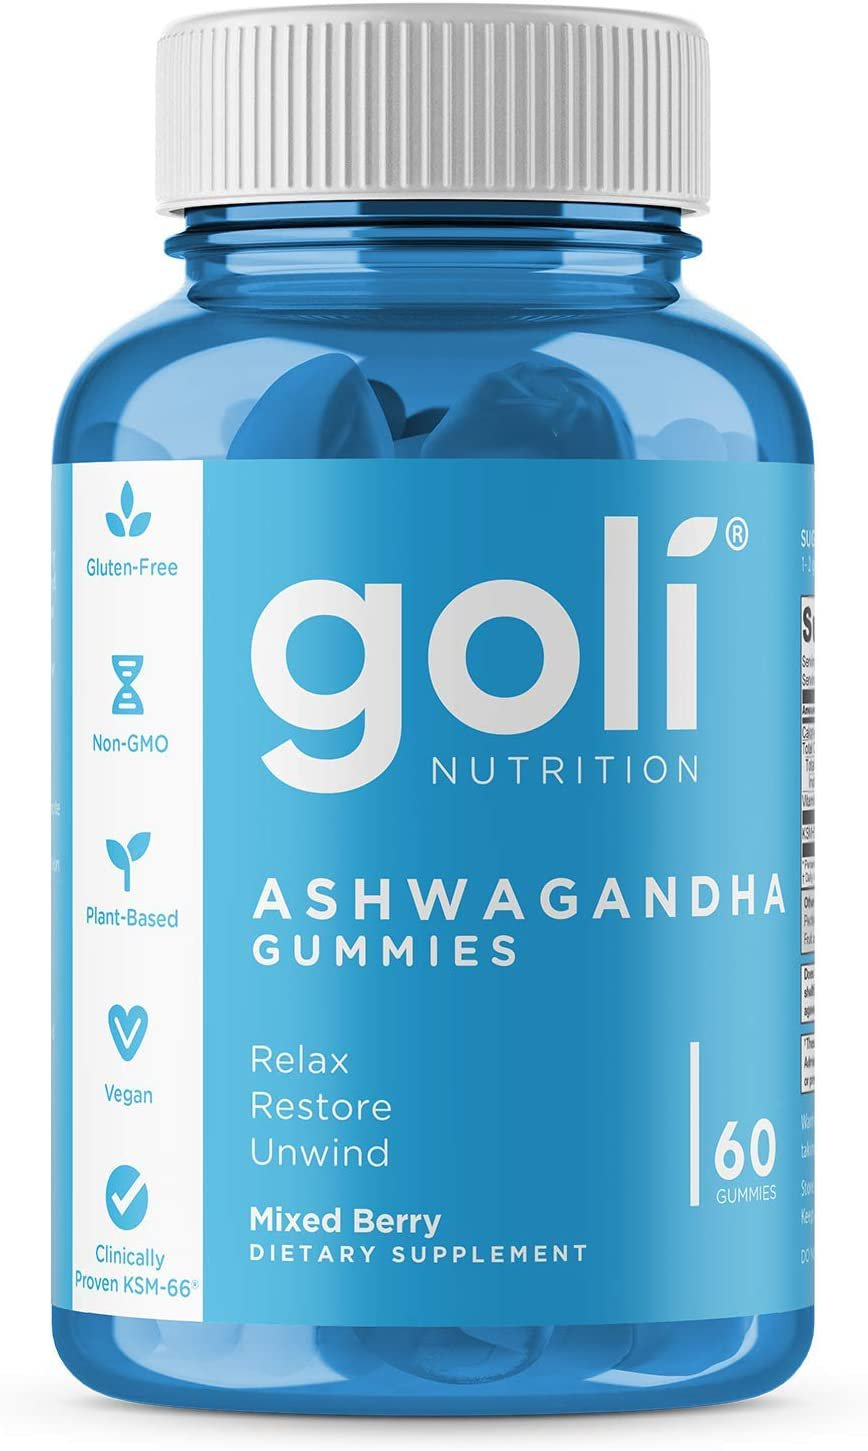 ASHWA Vitamin Gummy by Goli Nutrition - Ashwagandha and Vitamin D Gummies 60 Count